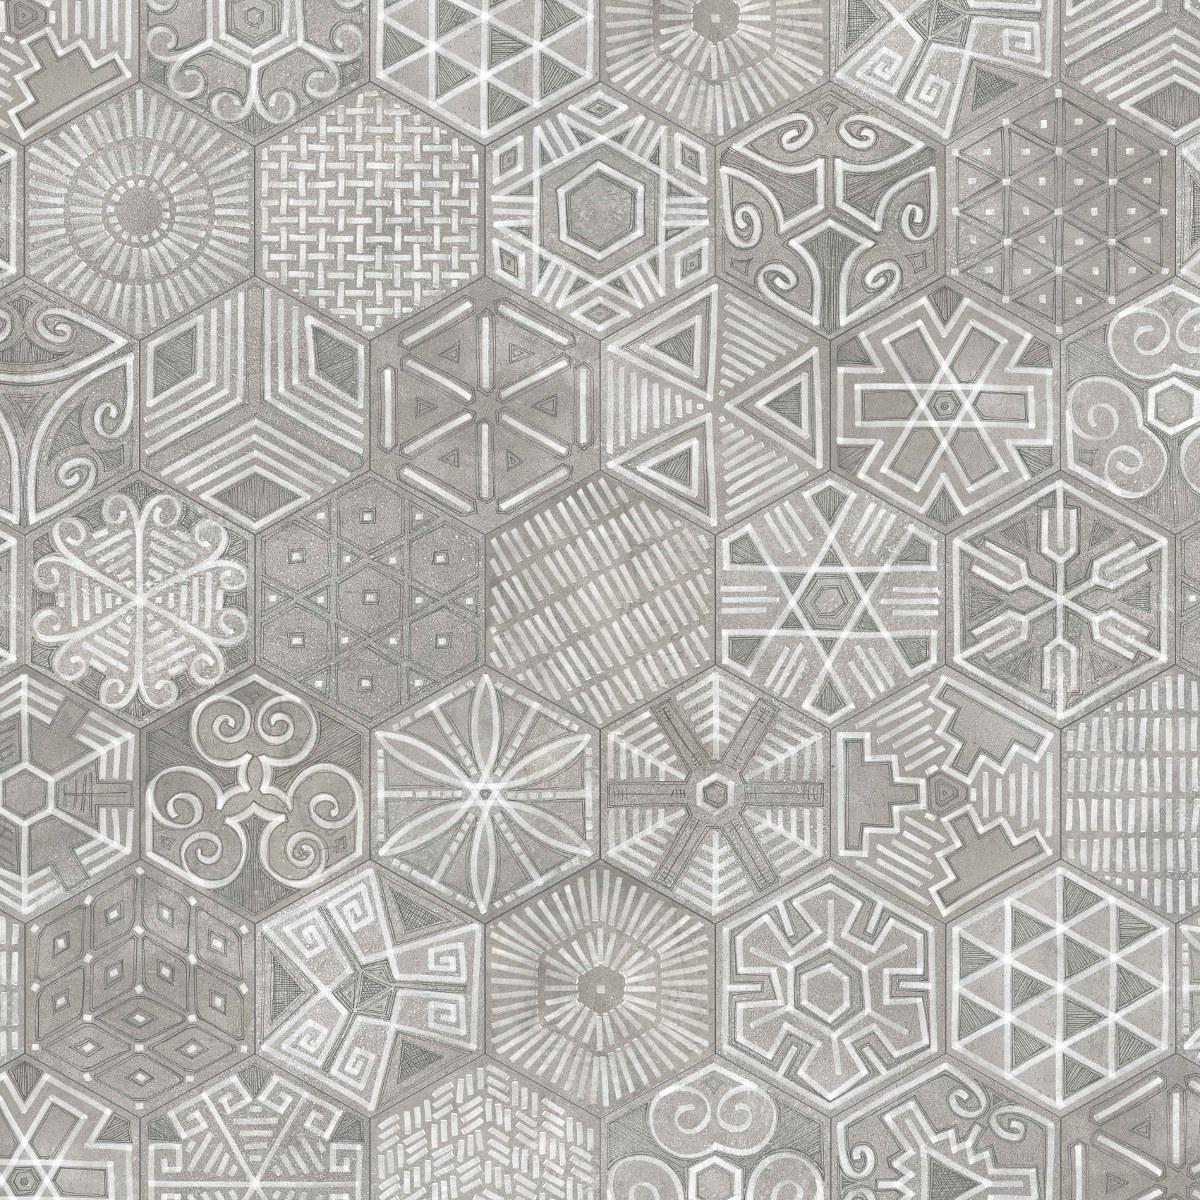 Inredning mönstrat klinker : Klinker Hexagon Igneus 23X26,6 - Kakel Online-Tiles R Us AB